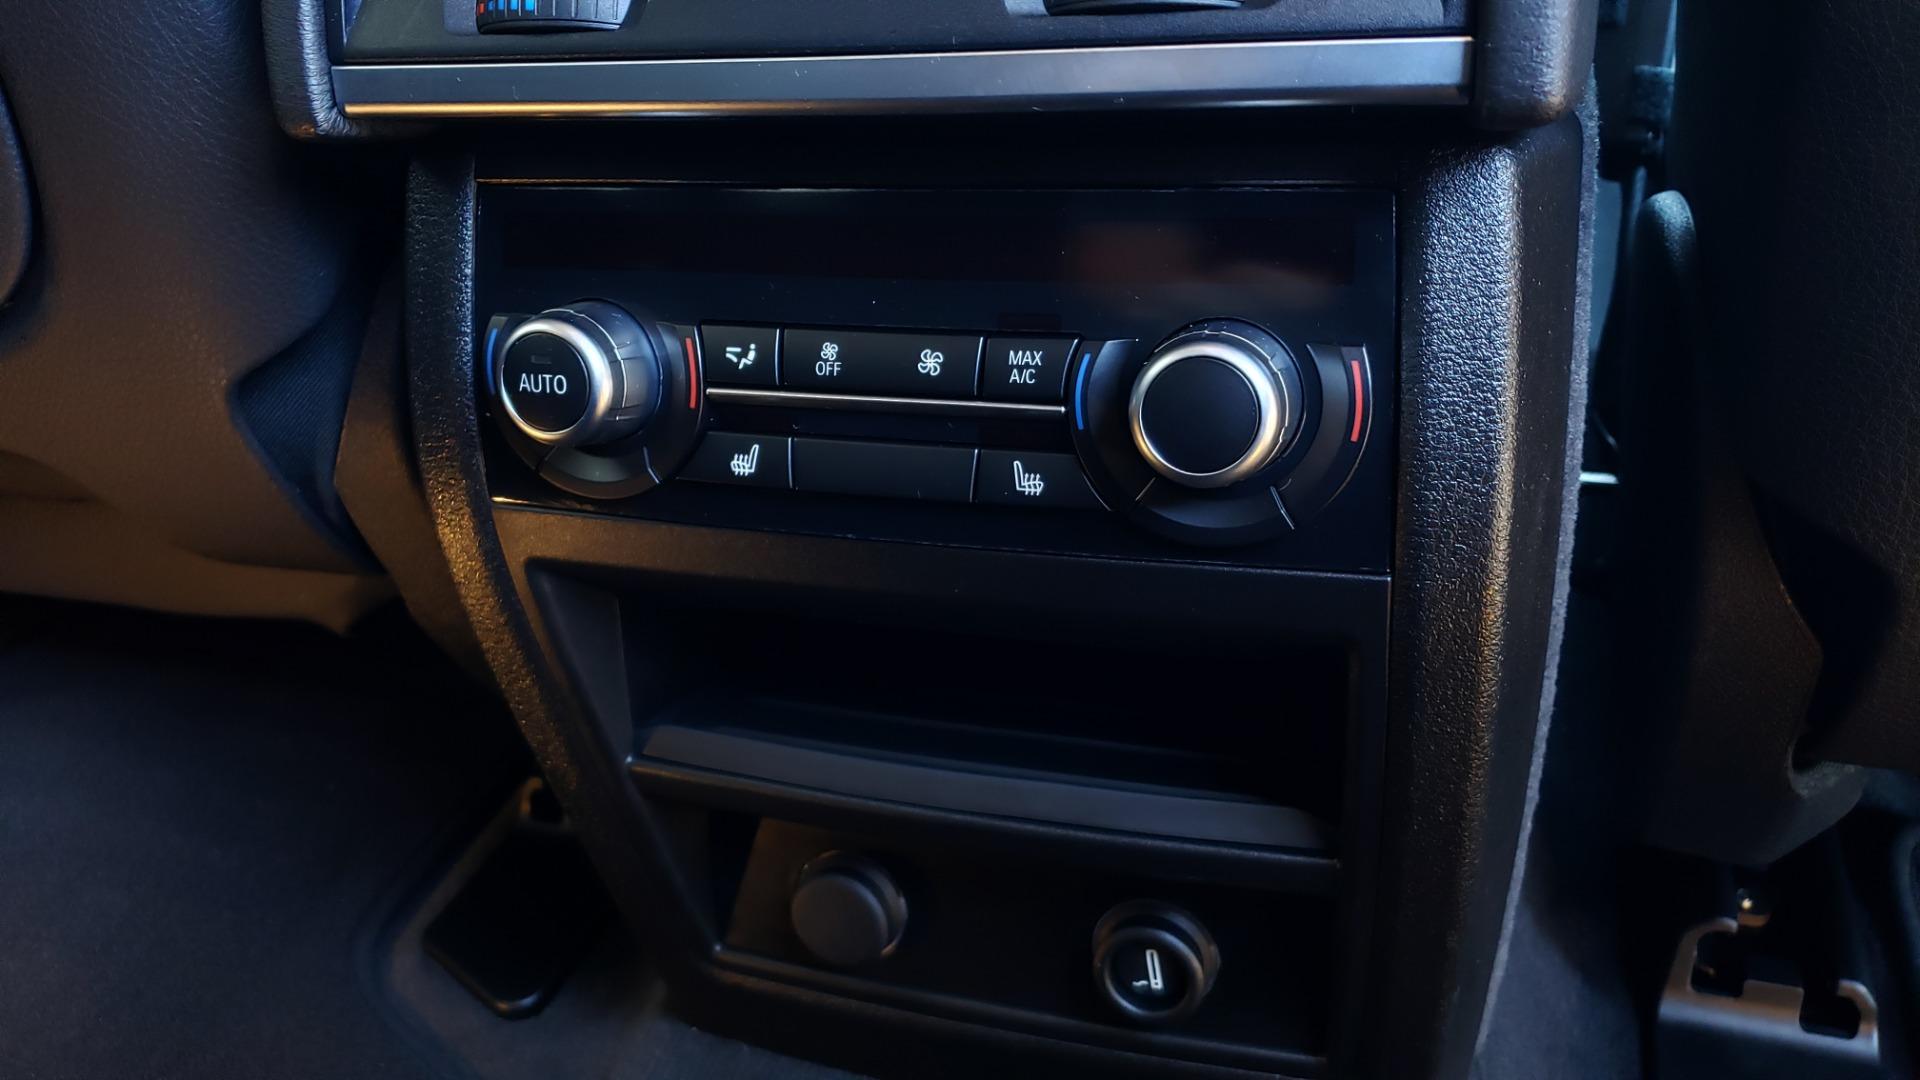 Used 2016 BMW X5 XDRIVE35I / PREM PKG / NAV / DRVR ASST PLUS / REARVIEW for sale $25,765 at Formula Imports in Charlotte NC 28227 54